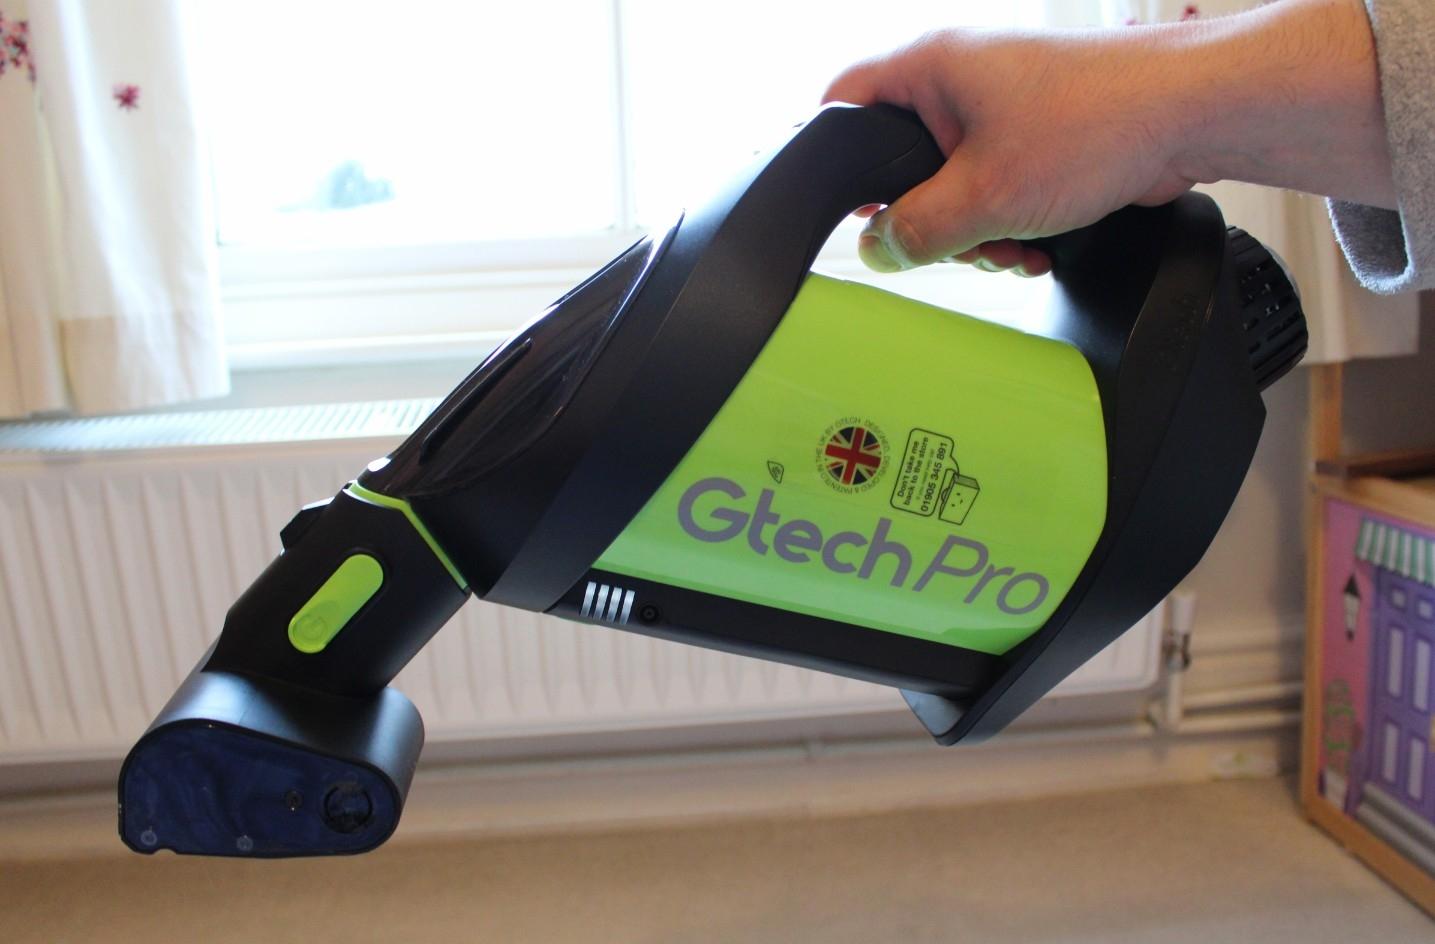 Gtech handheld - Gtech Pro Review